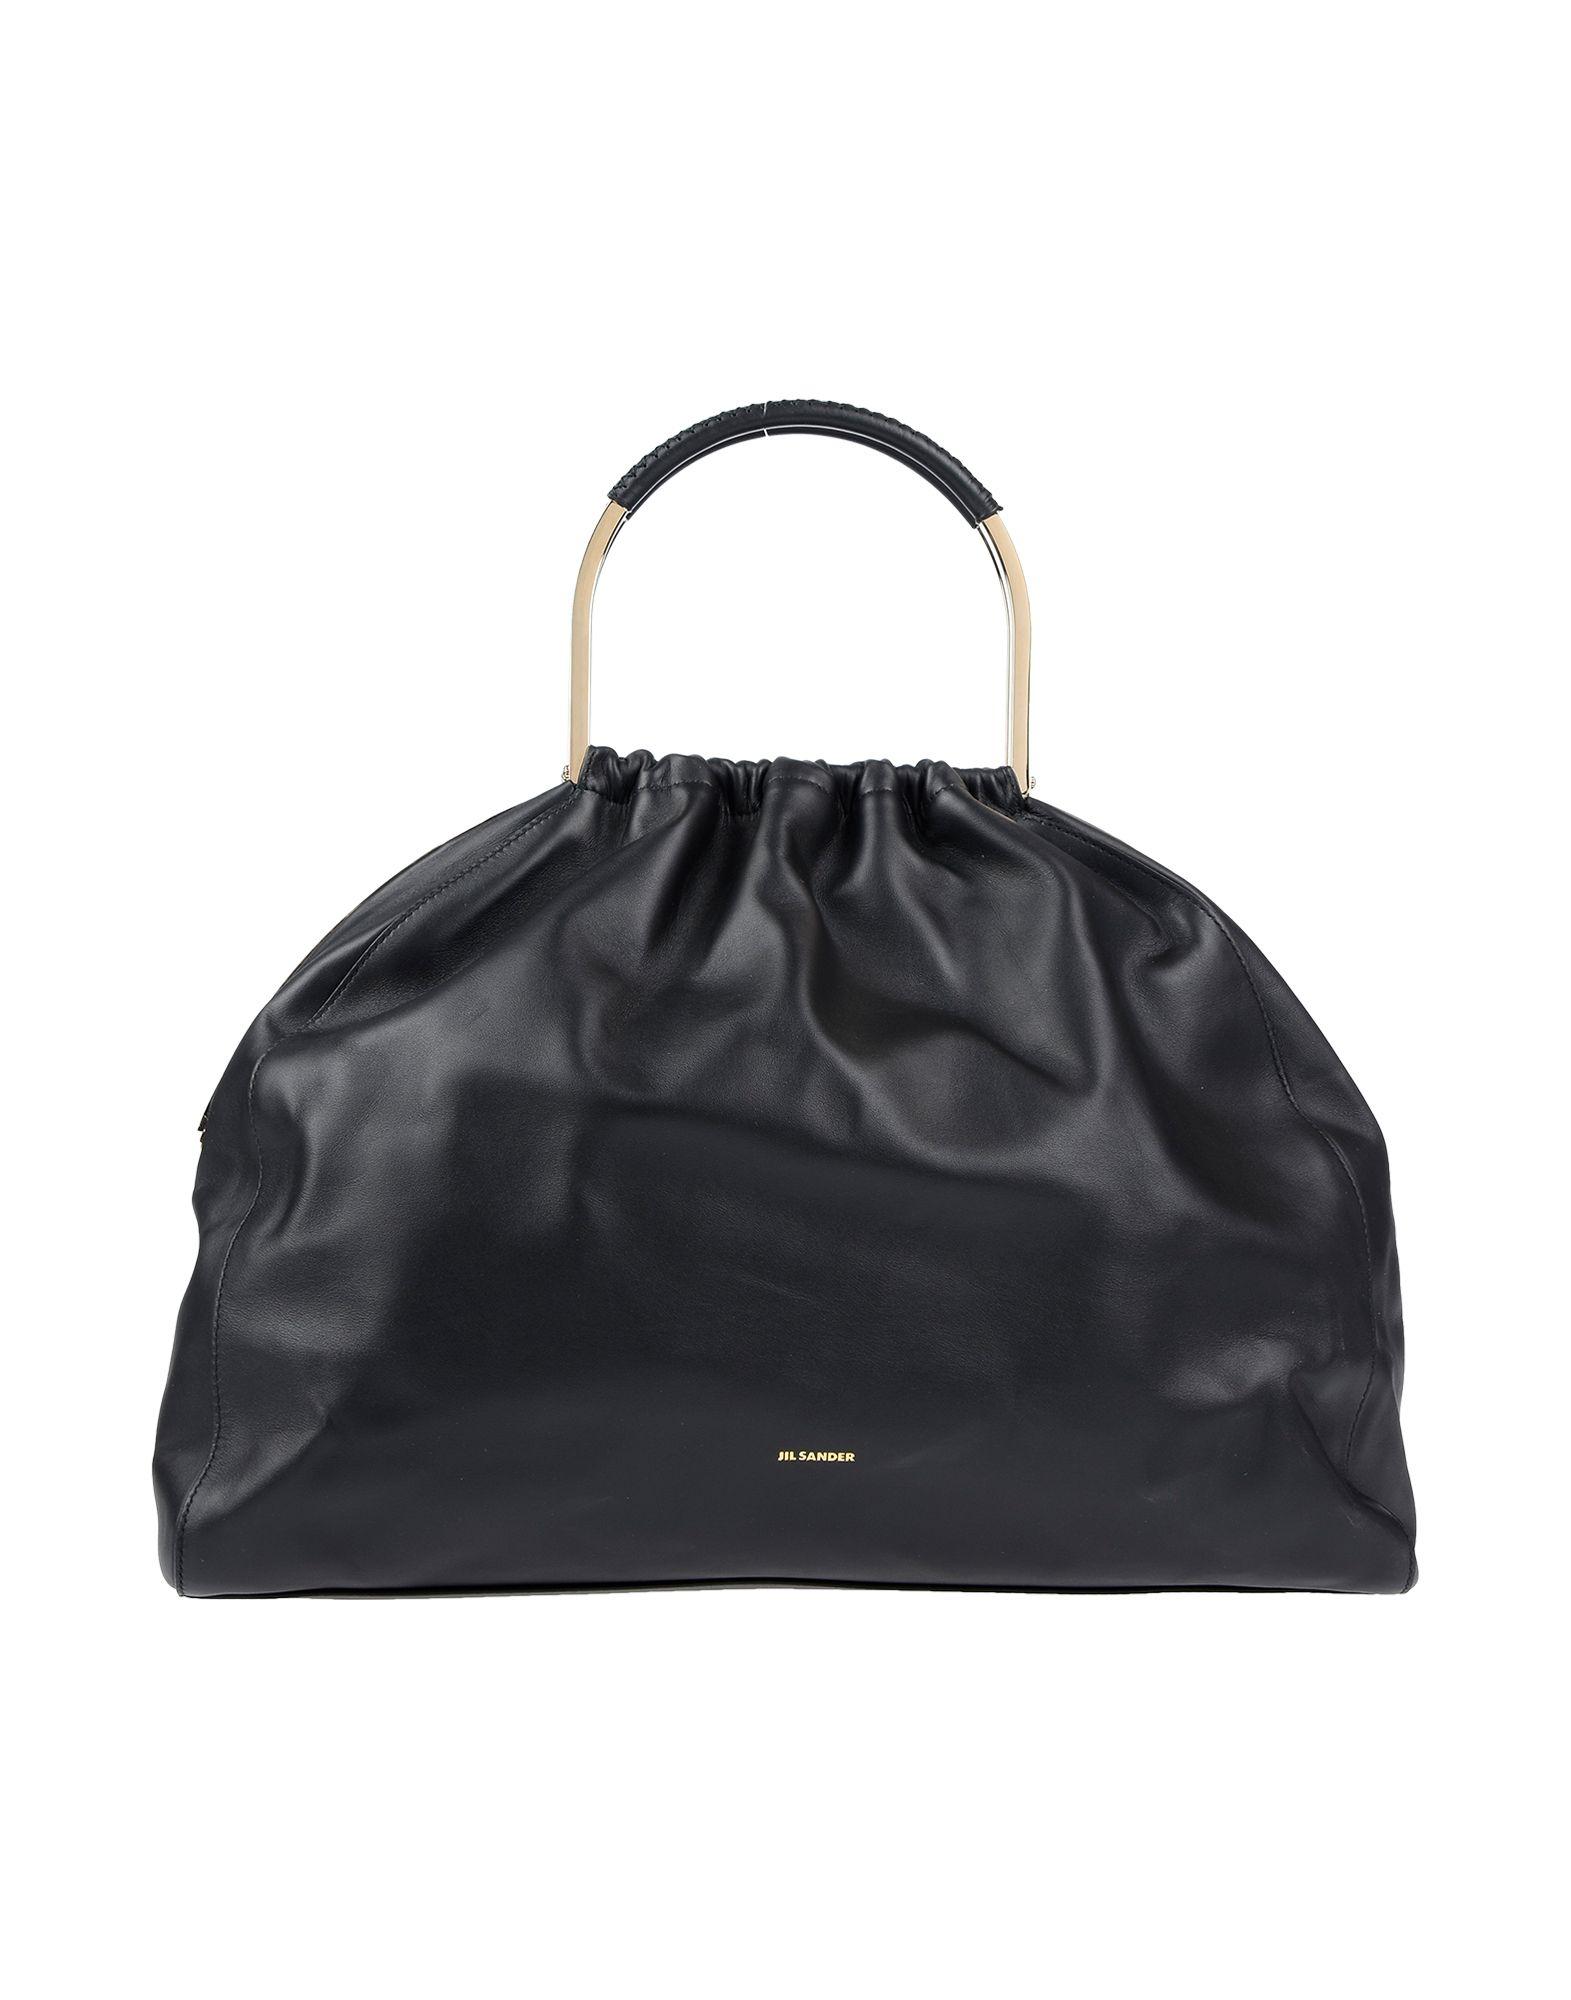 fa19fe3f0a Jil Sander Handbags - Jil Sander Women - YOOX United States